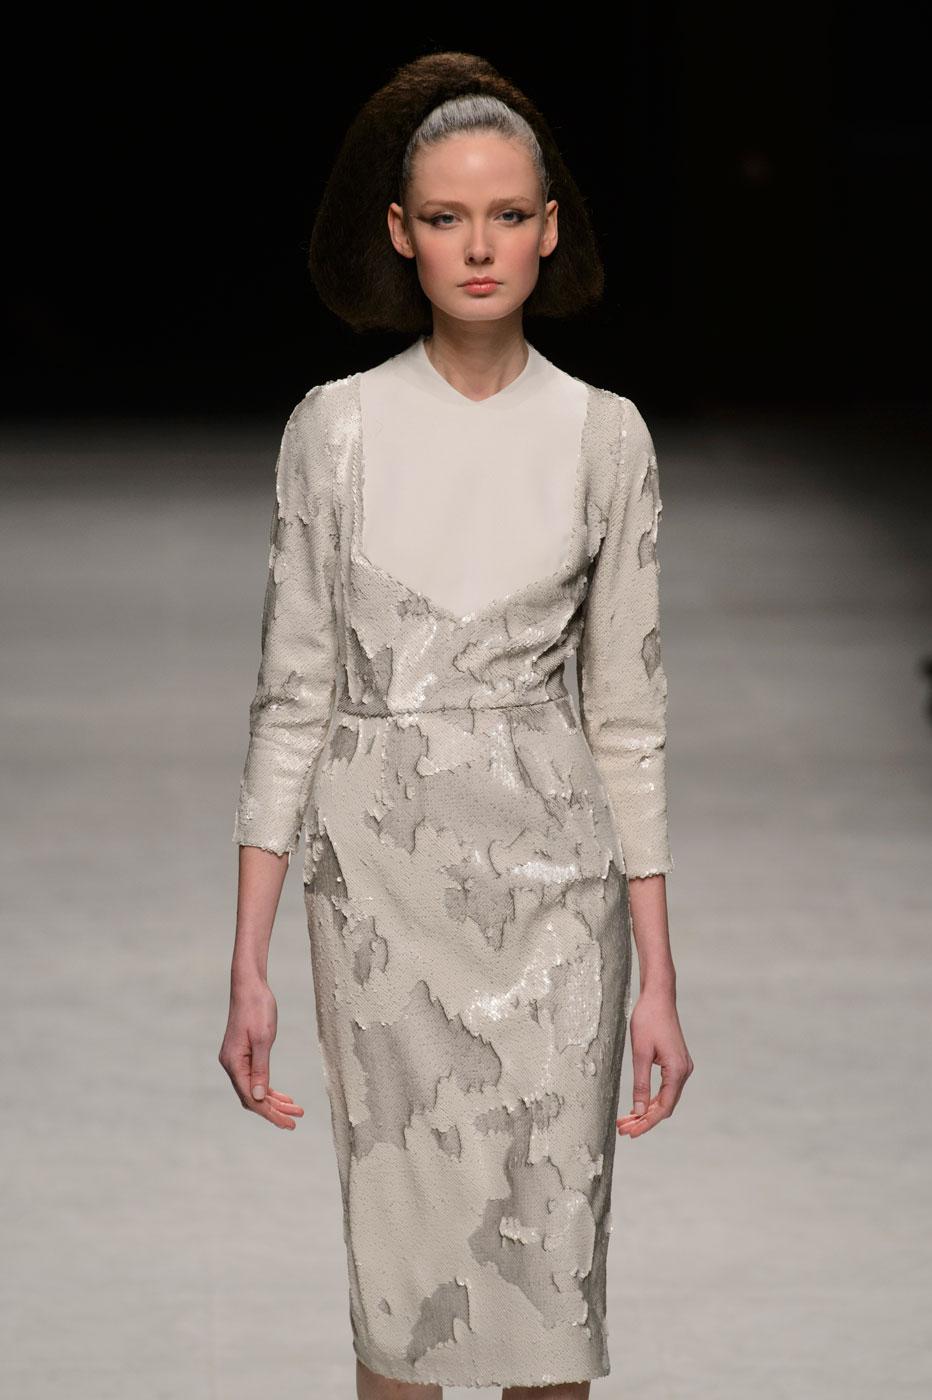 Julien-Fournie-Prive-fashion-runway-show-haute-couture-paris-spring-2015-the-impression-03